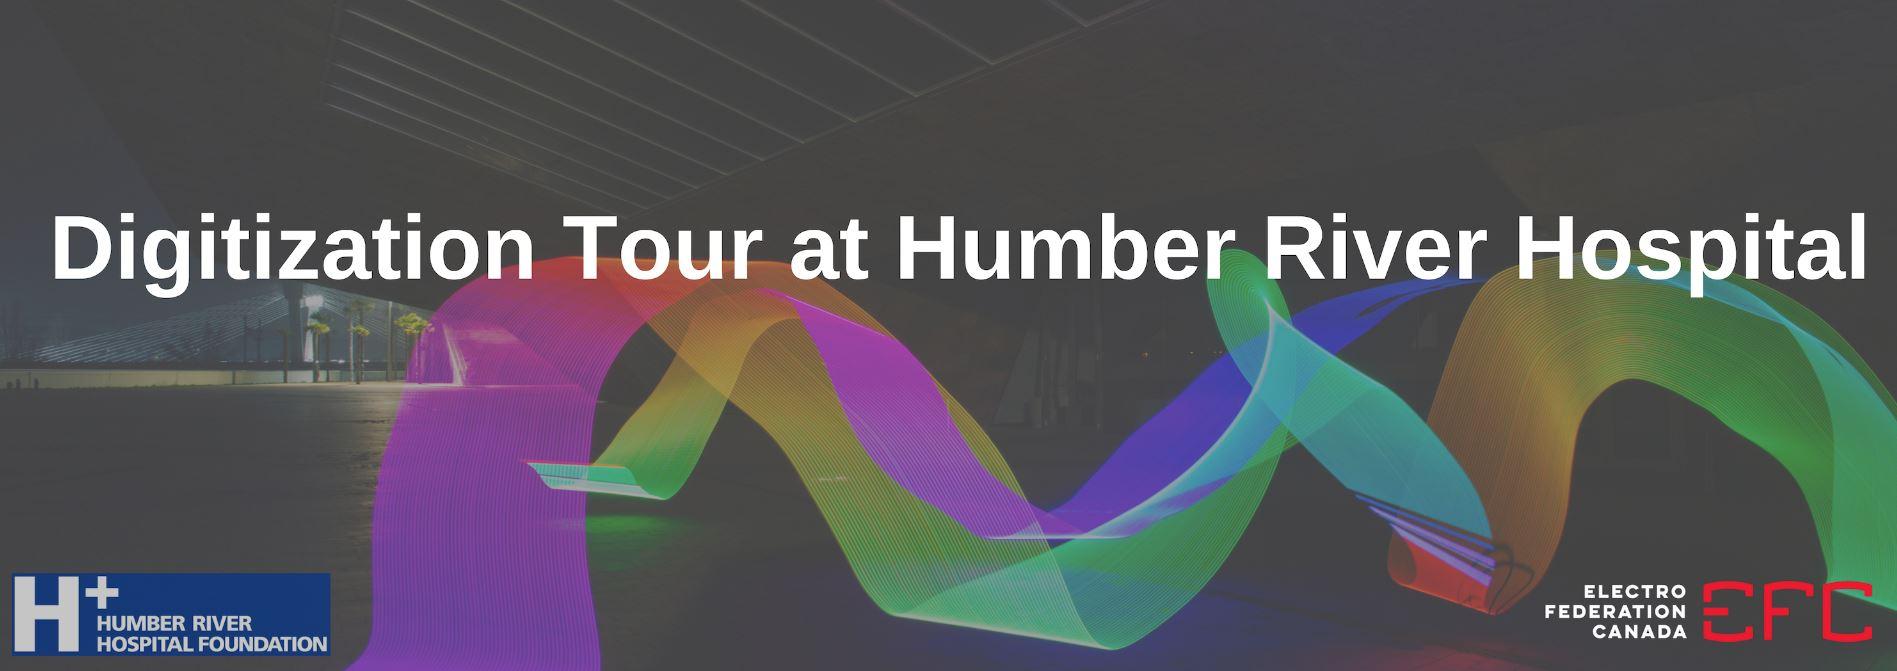 EFC Ontario Region hosts Digitization Tour at Humber River Hospital